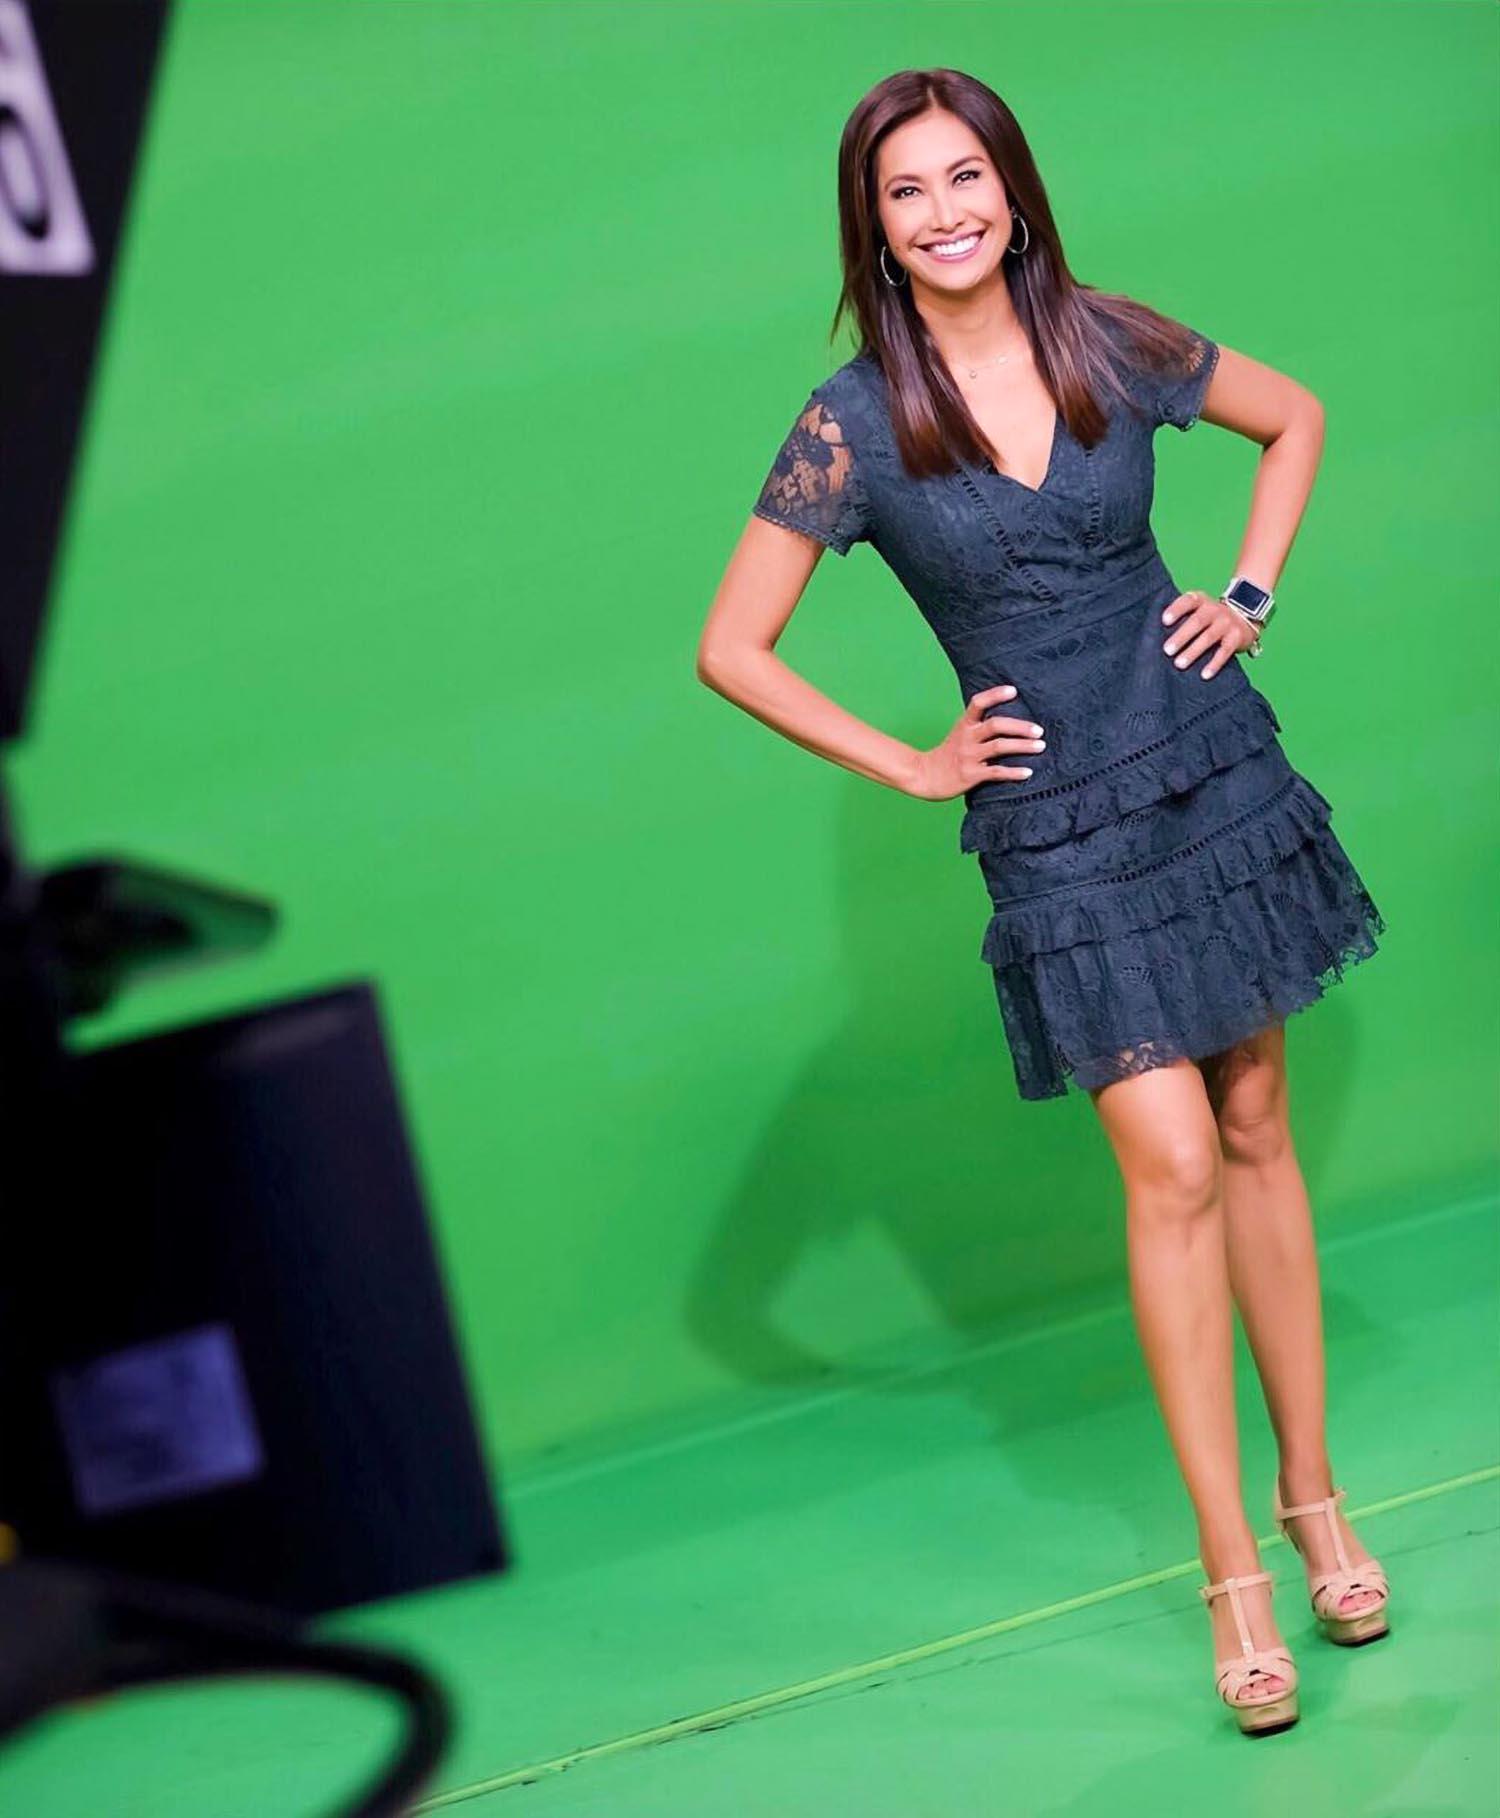 Maria Quiban on green screen